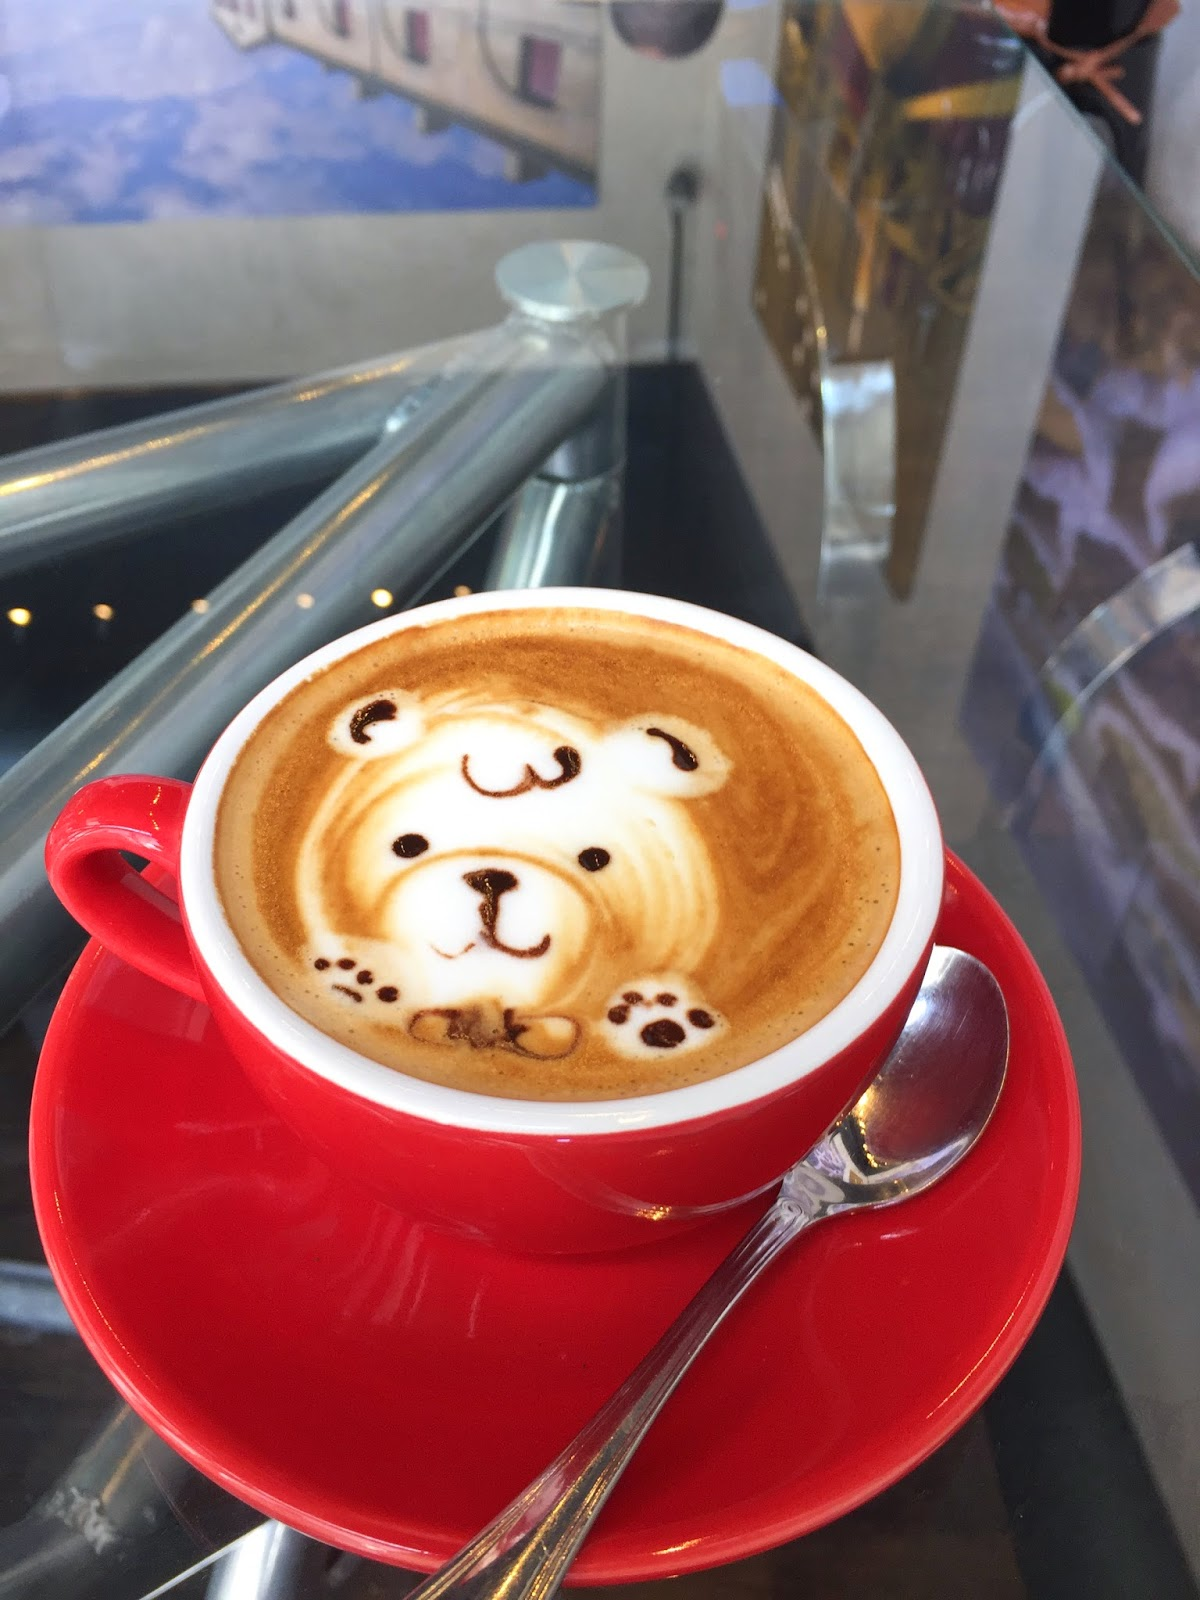 Cafe Near Outram Park Mrt